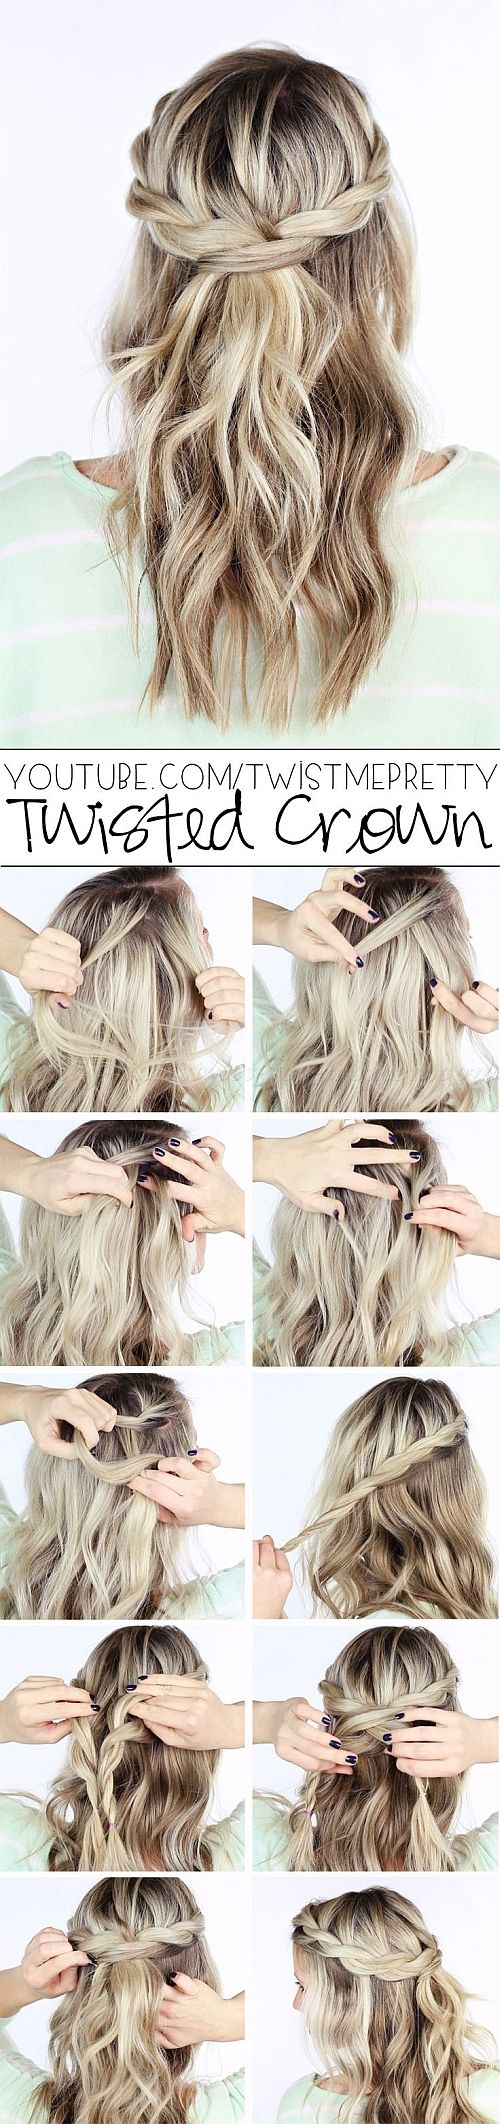 best hair udid images on pinterest make up looks hair